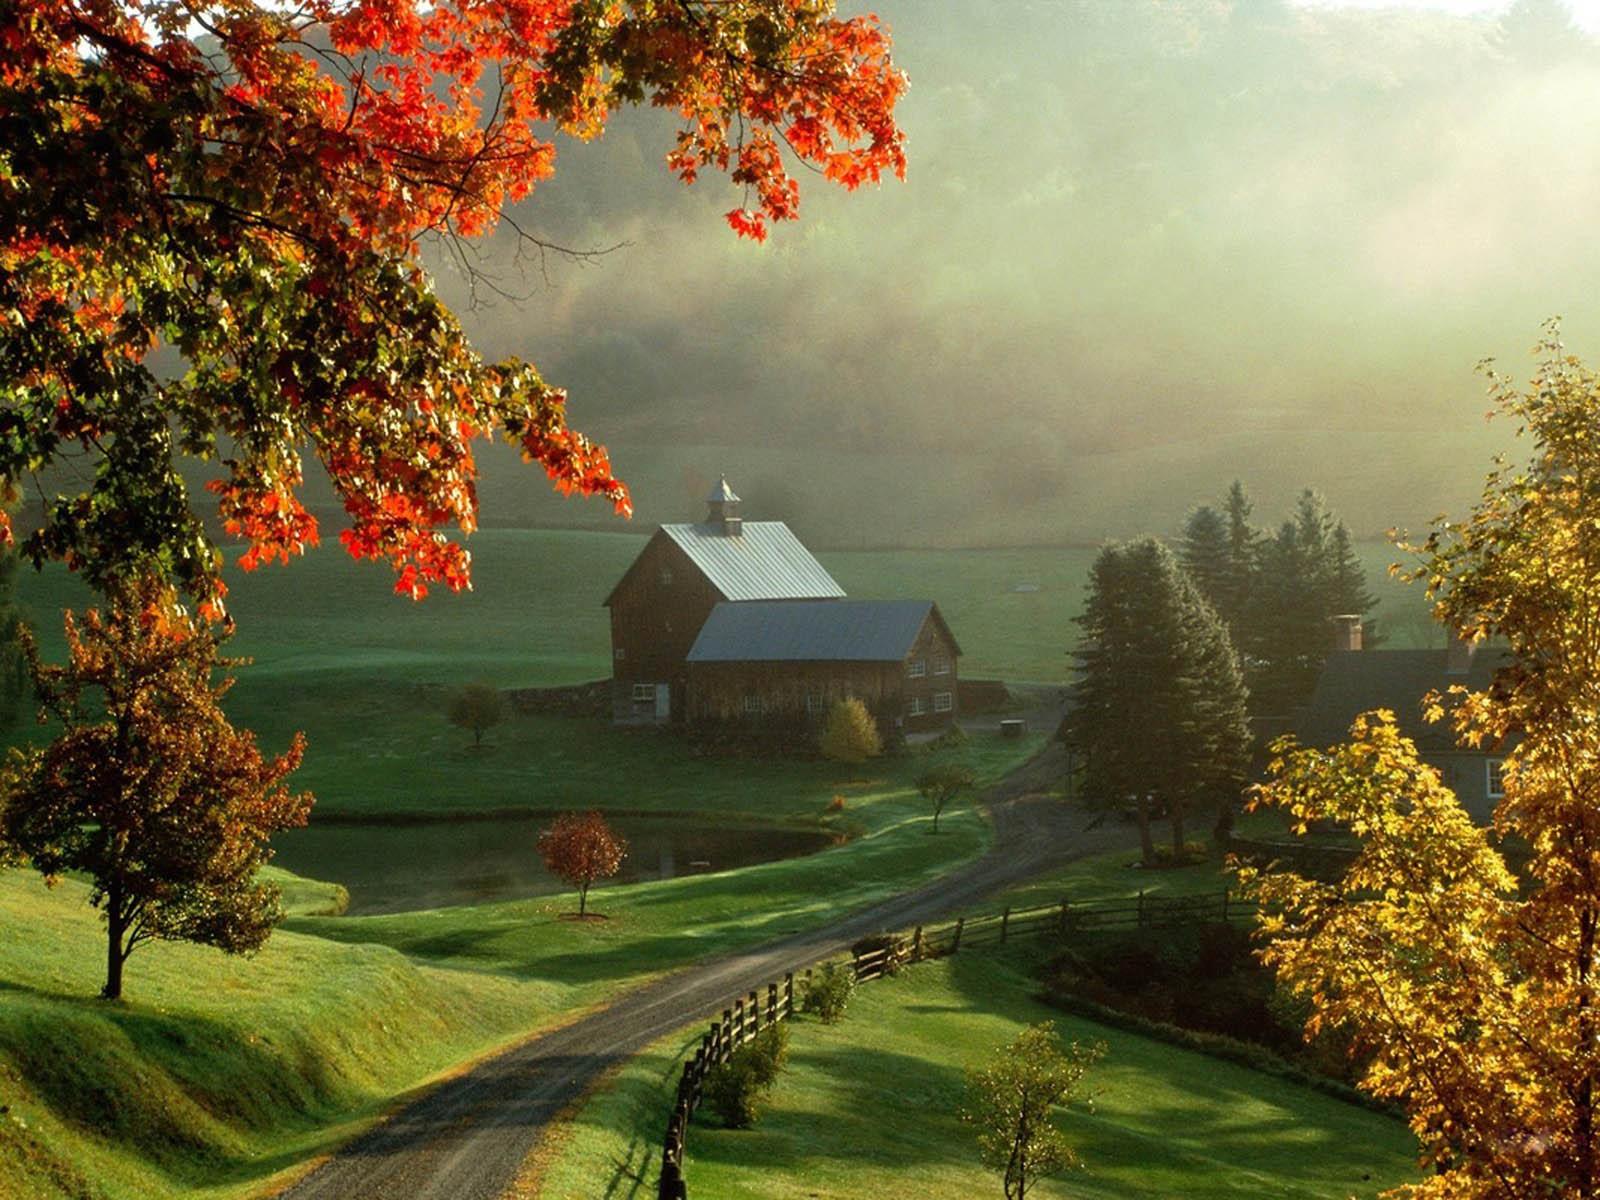 Wallpapers Beautiful Autumn Scenery Desktop Backgrounds Beautiful 1600x1200